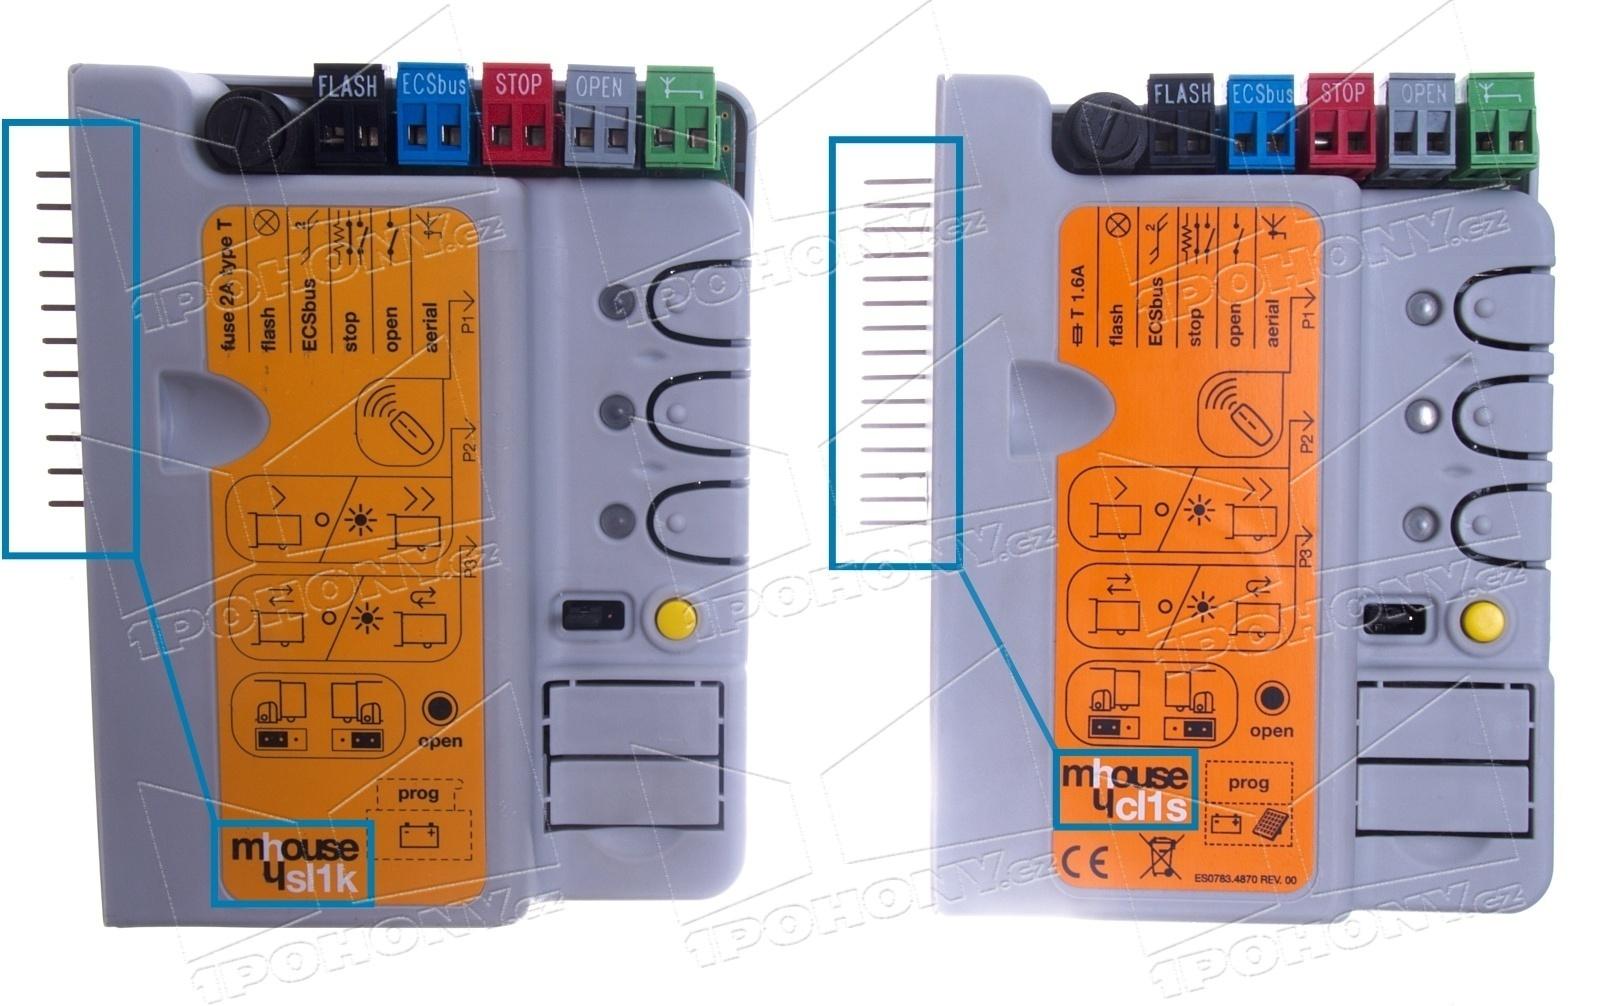 330455-330456-Mhouse-porovnani-elektronik-CL1KIT-CL1SK-010